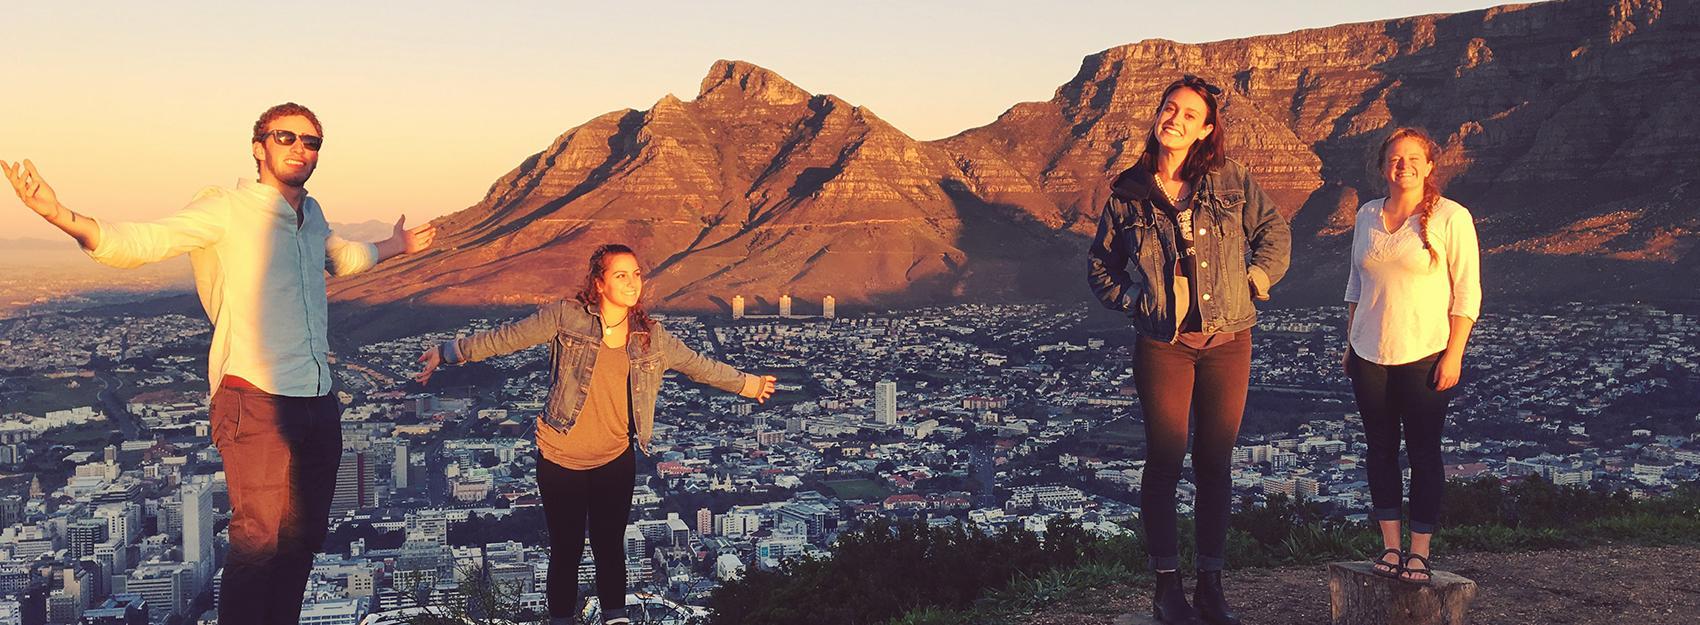 South Africa Student Visa